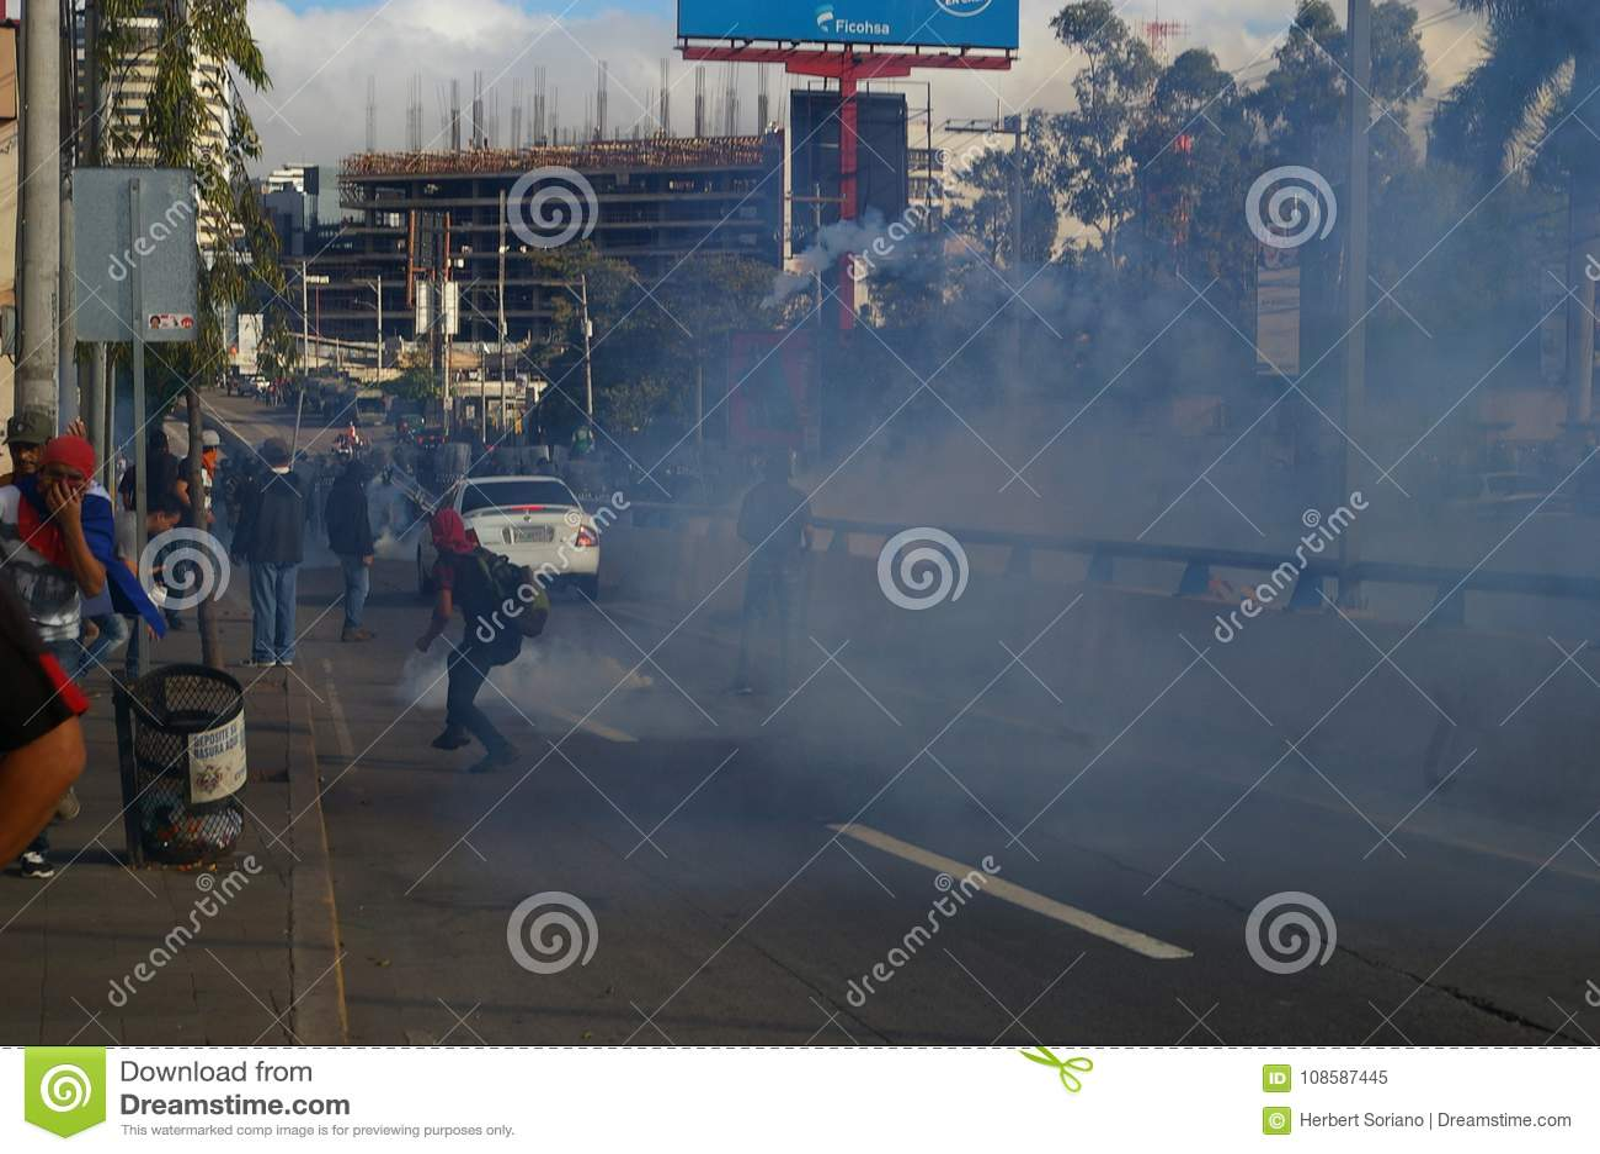 Le Honduras protestation march en janvier 2018 Tegucigalpa, Honduras 1